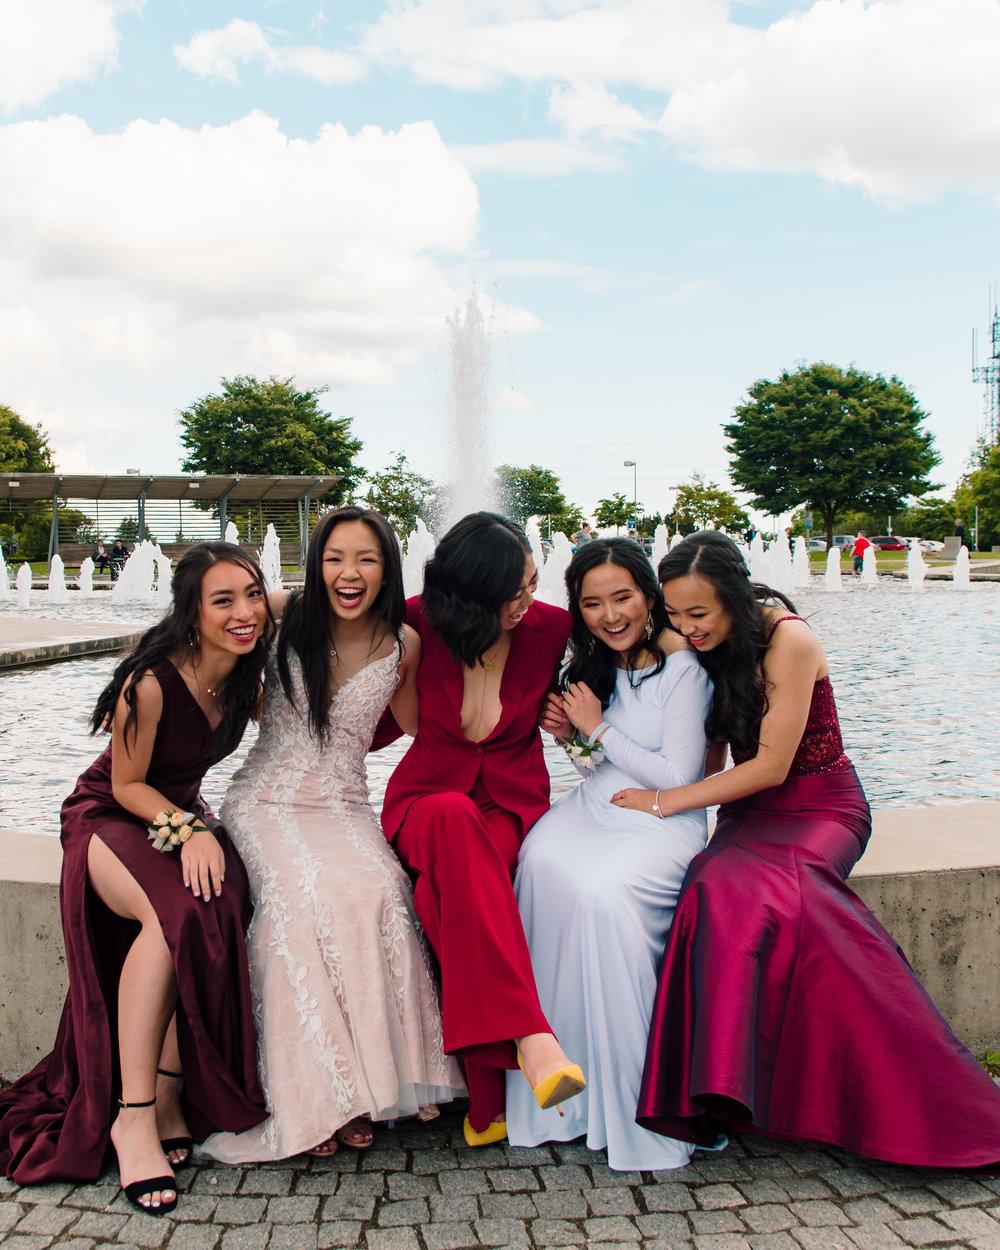 wedding (1 of 3).jpg